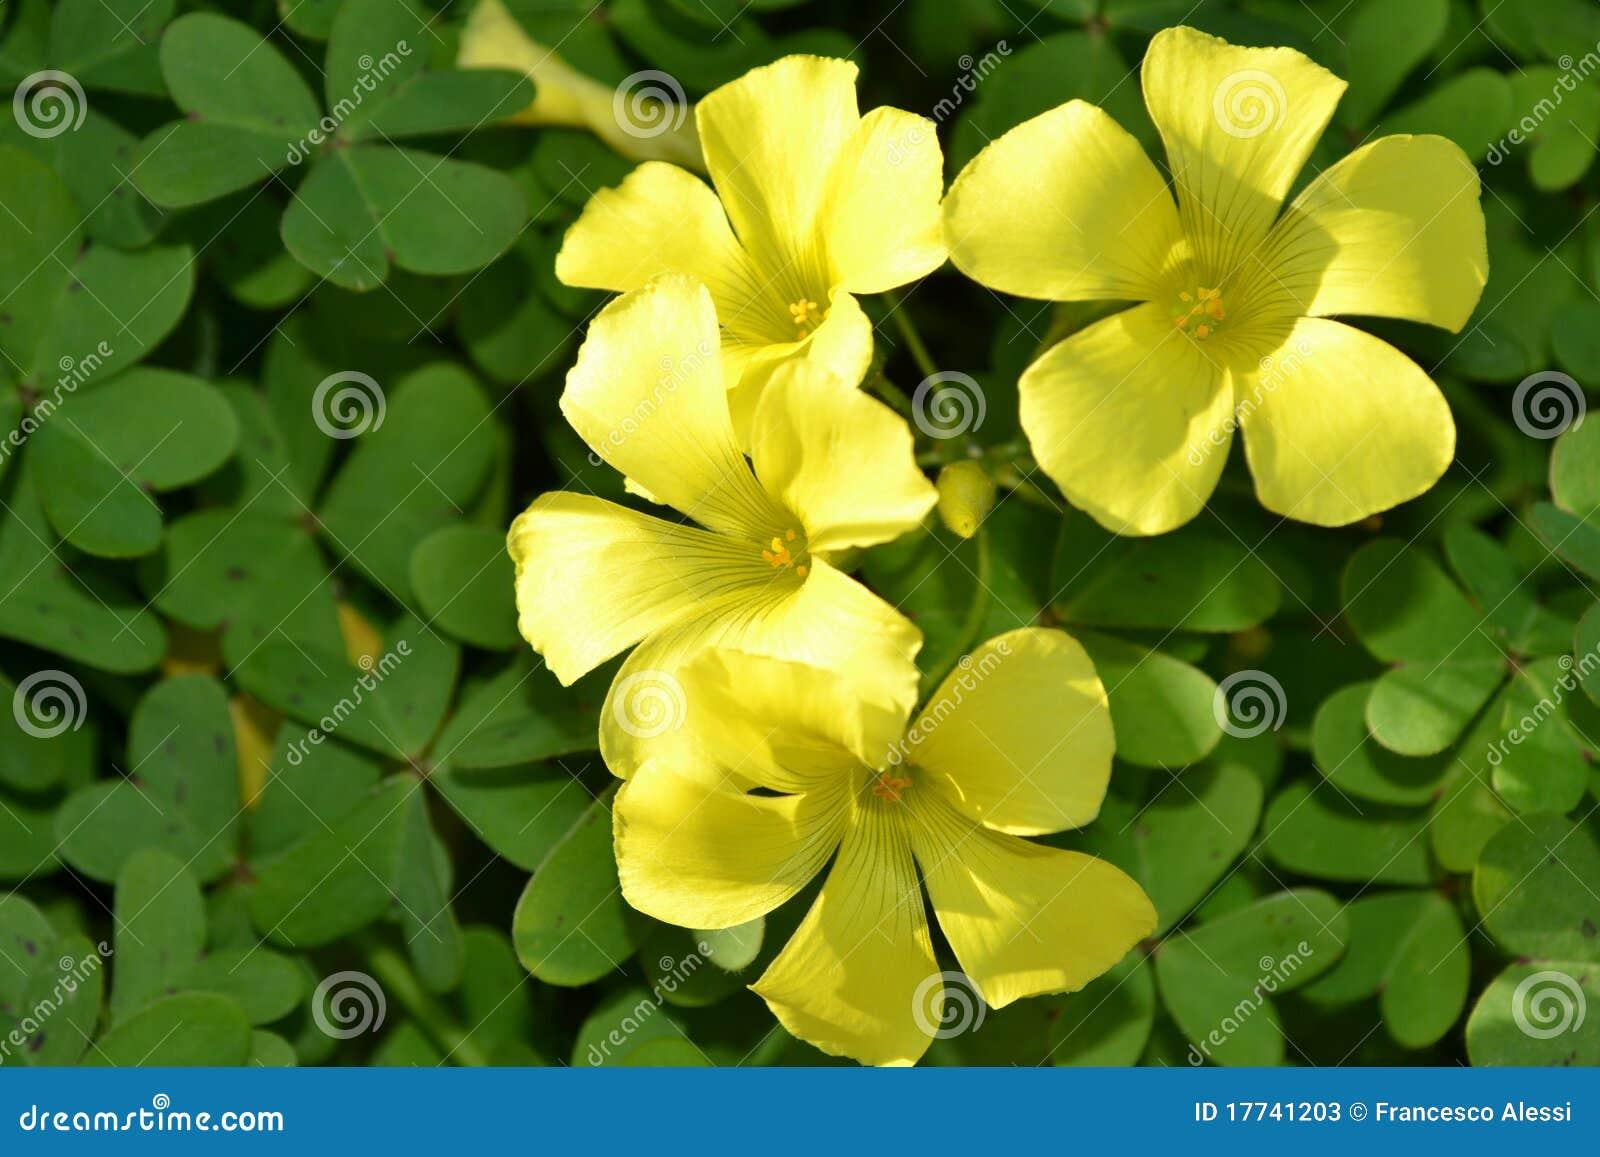 Yellow Clover Flowers Stock Photos - Image: 17741203